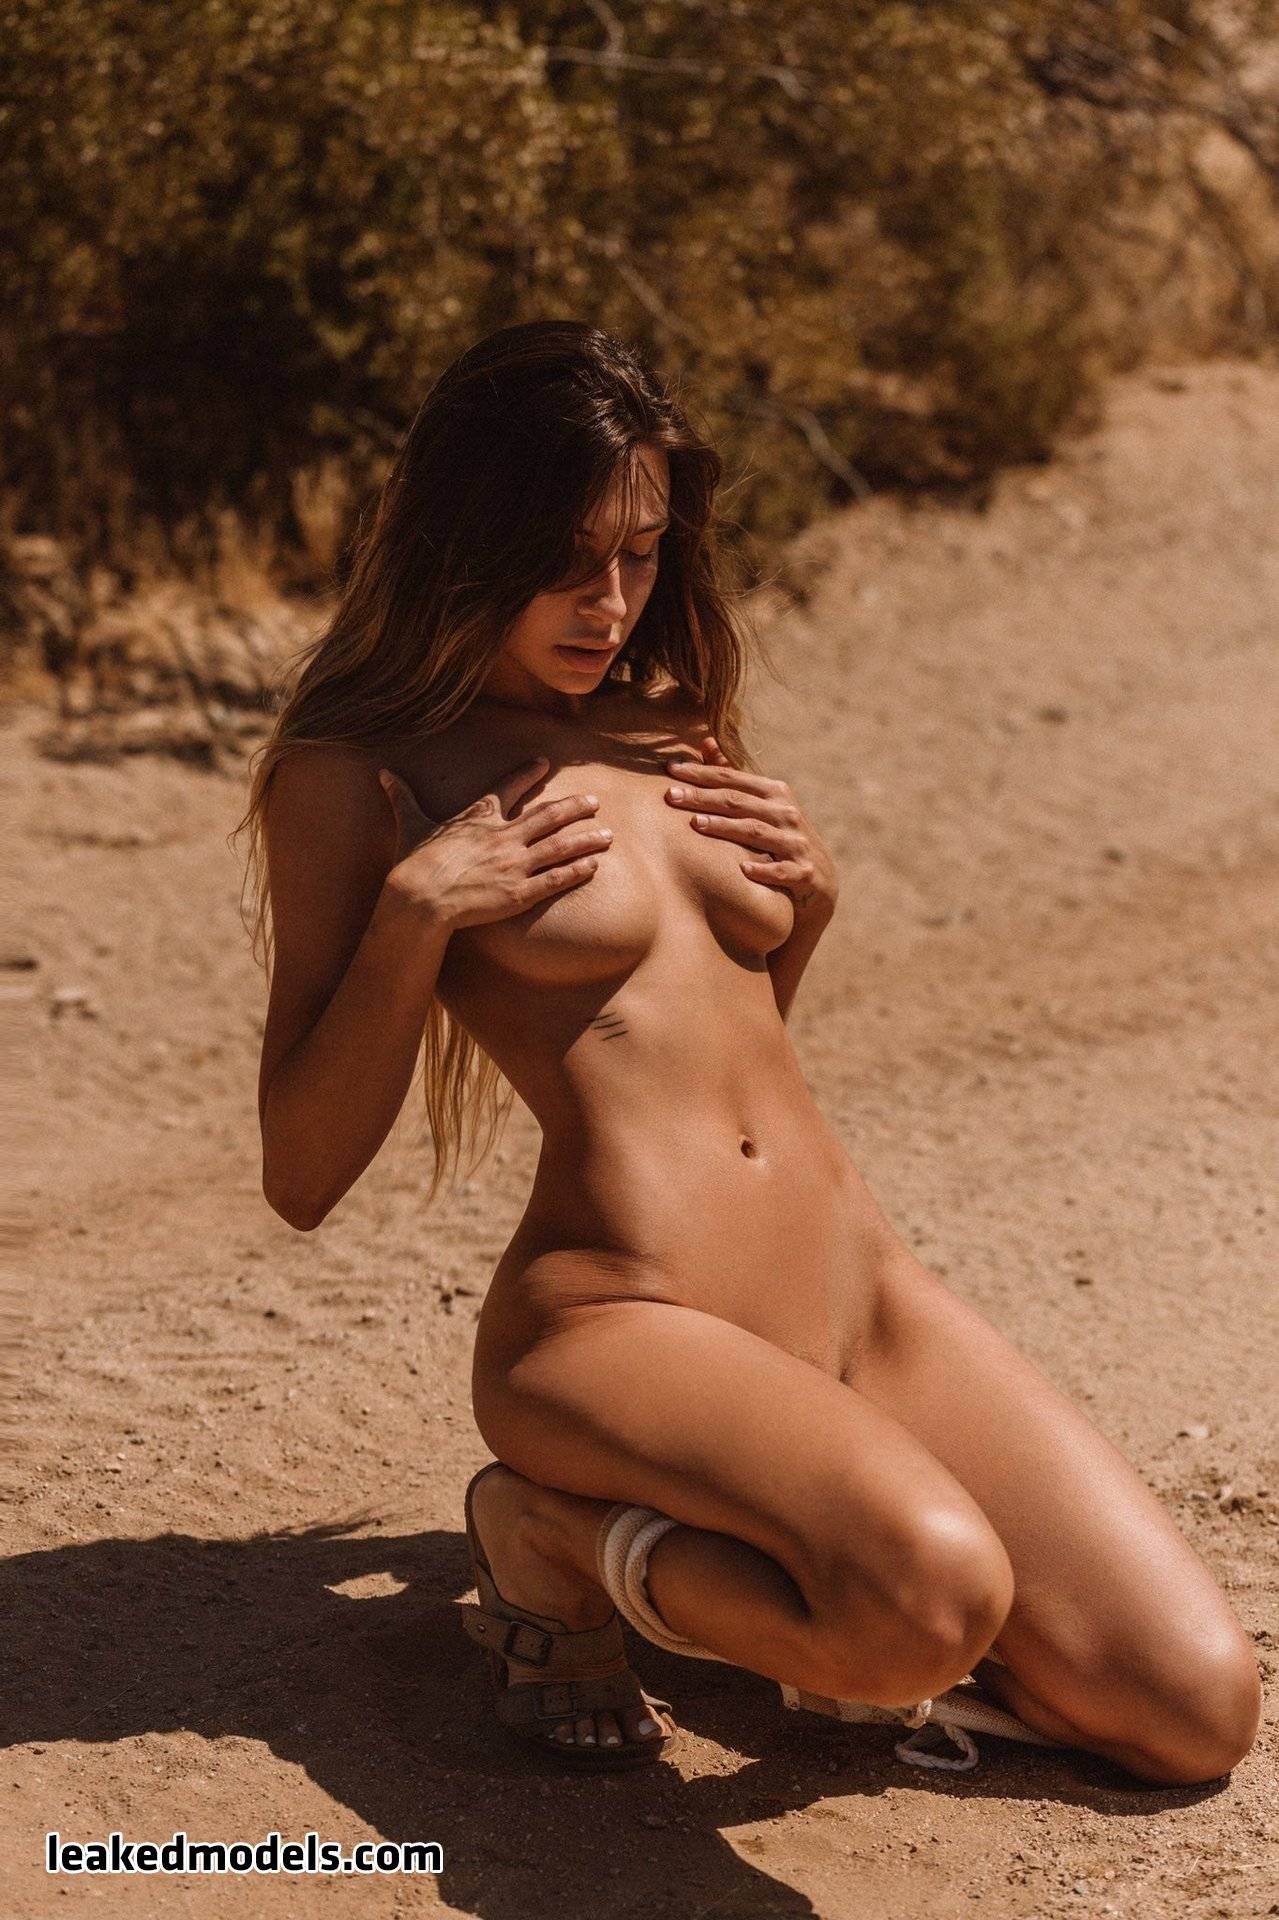 Sunny ray – sunnyrayxo OnlyFans Nude Leaks (35 Photos)